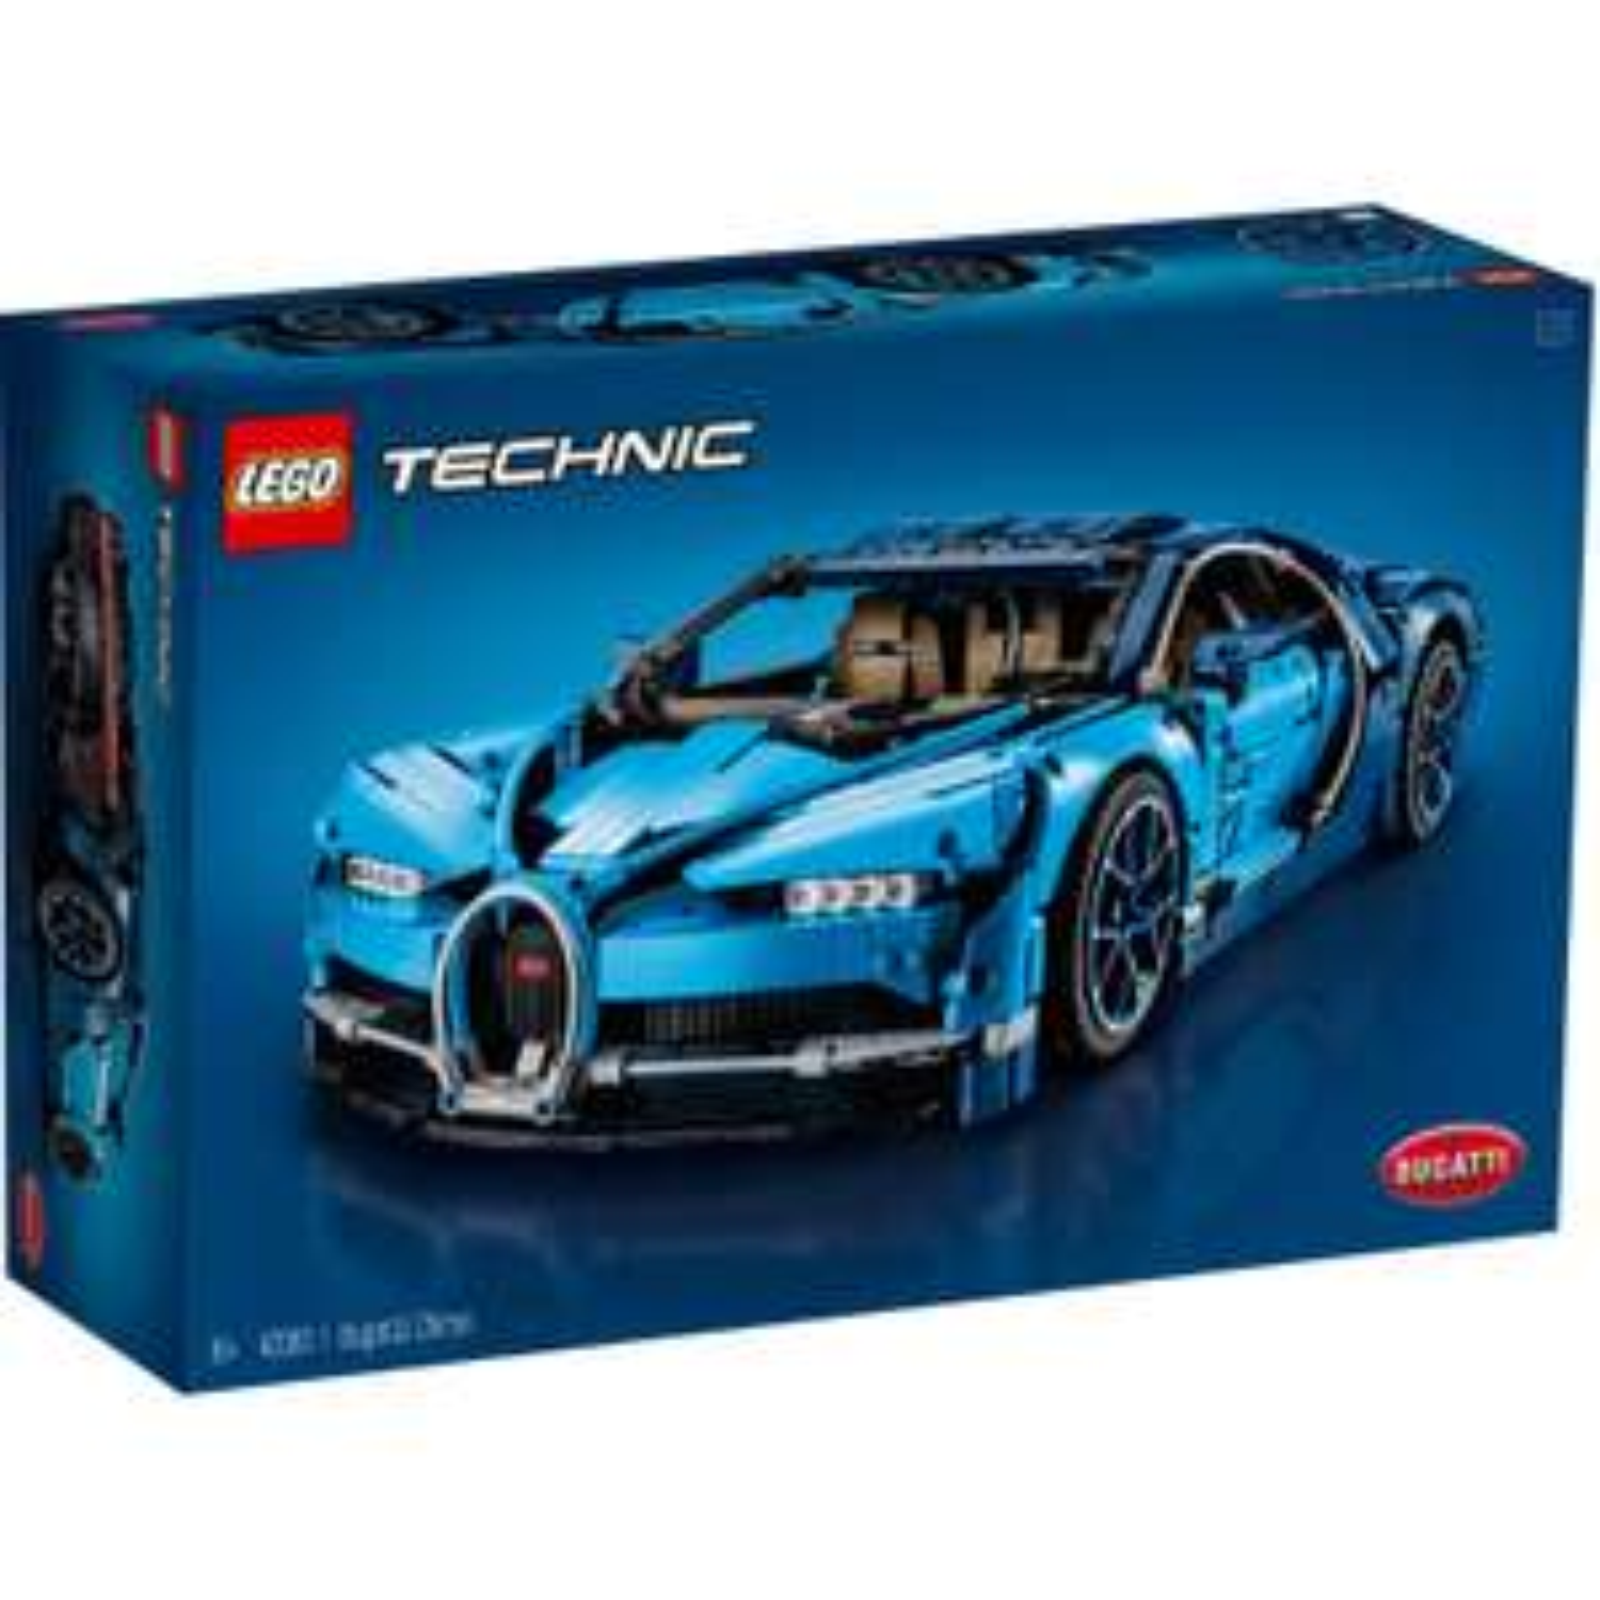 Jeu de Construction Lego Technic: Bugatti Chiron